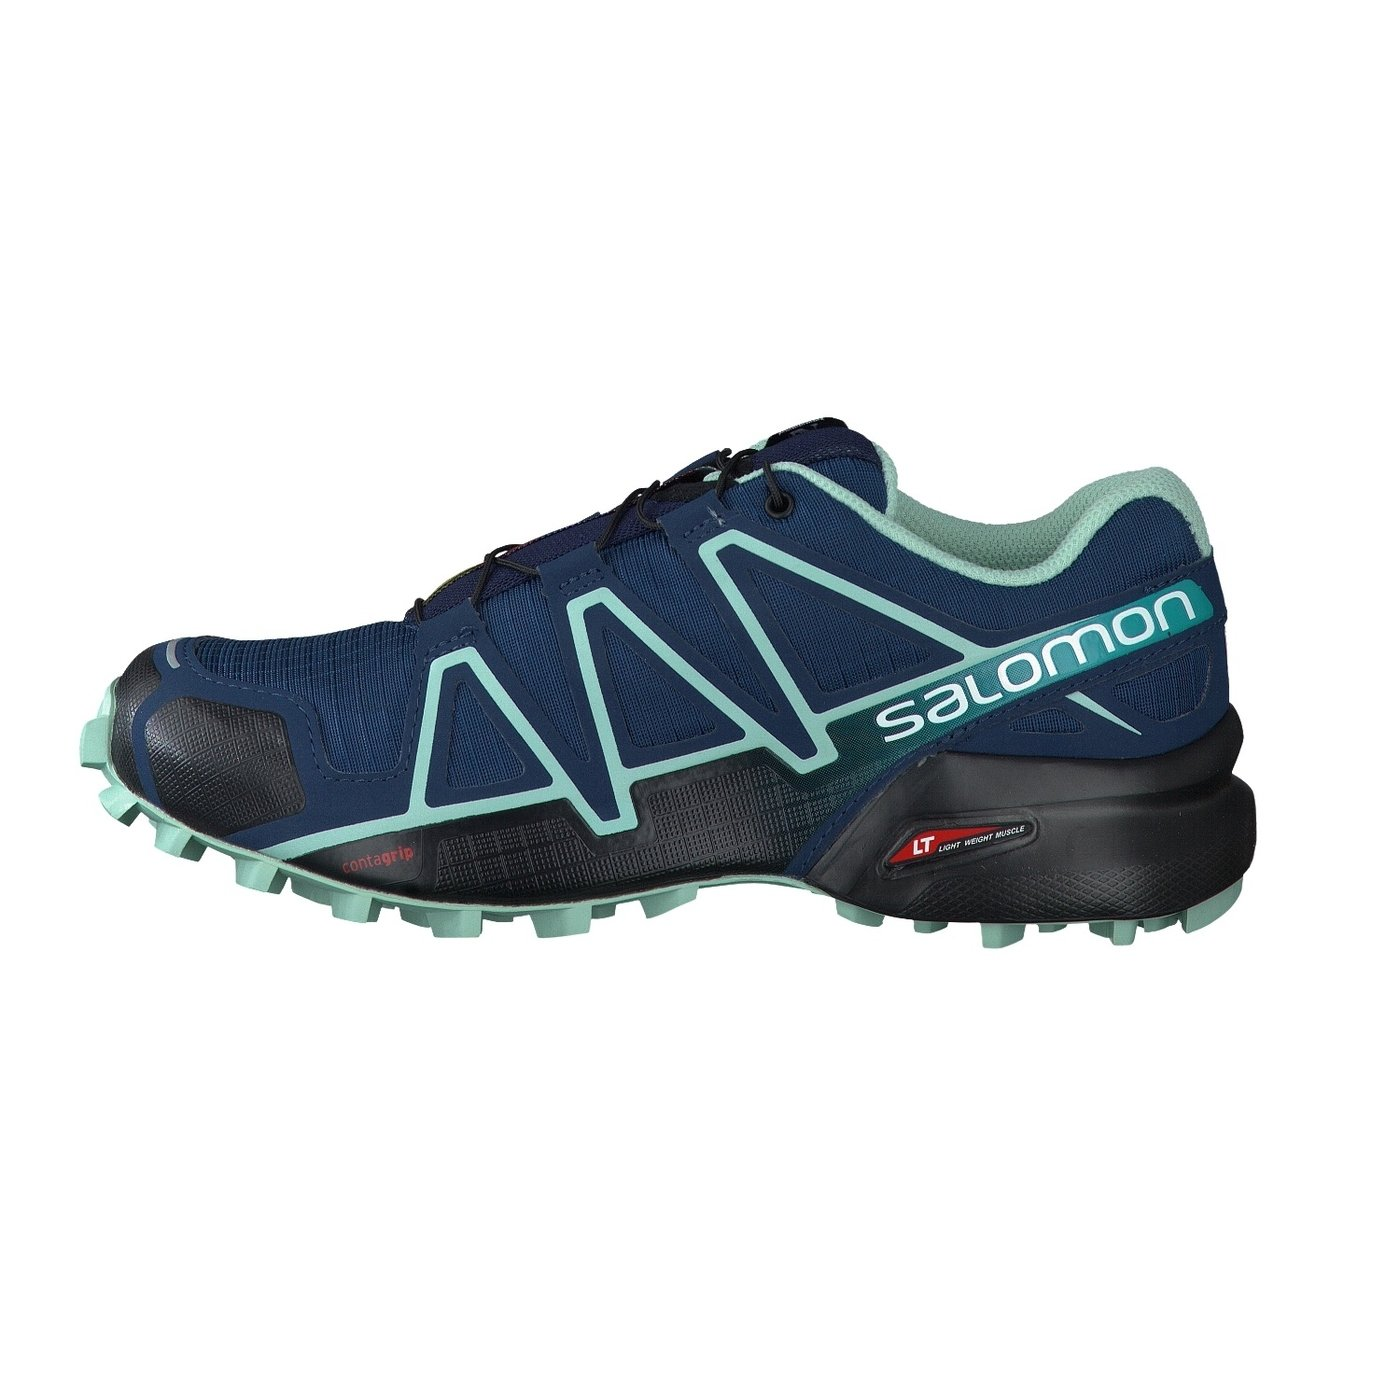 Chaussures de Trail Femme SALOMON Speedcross 4